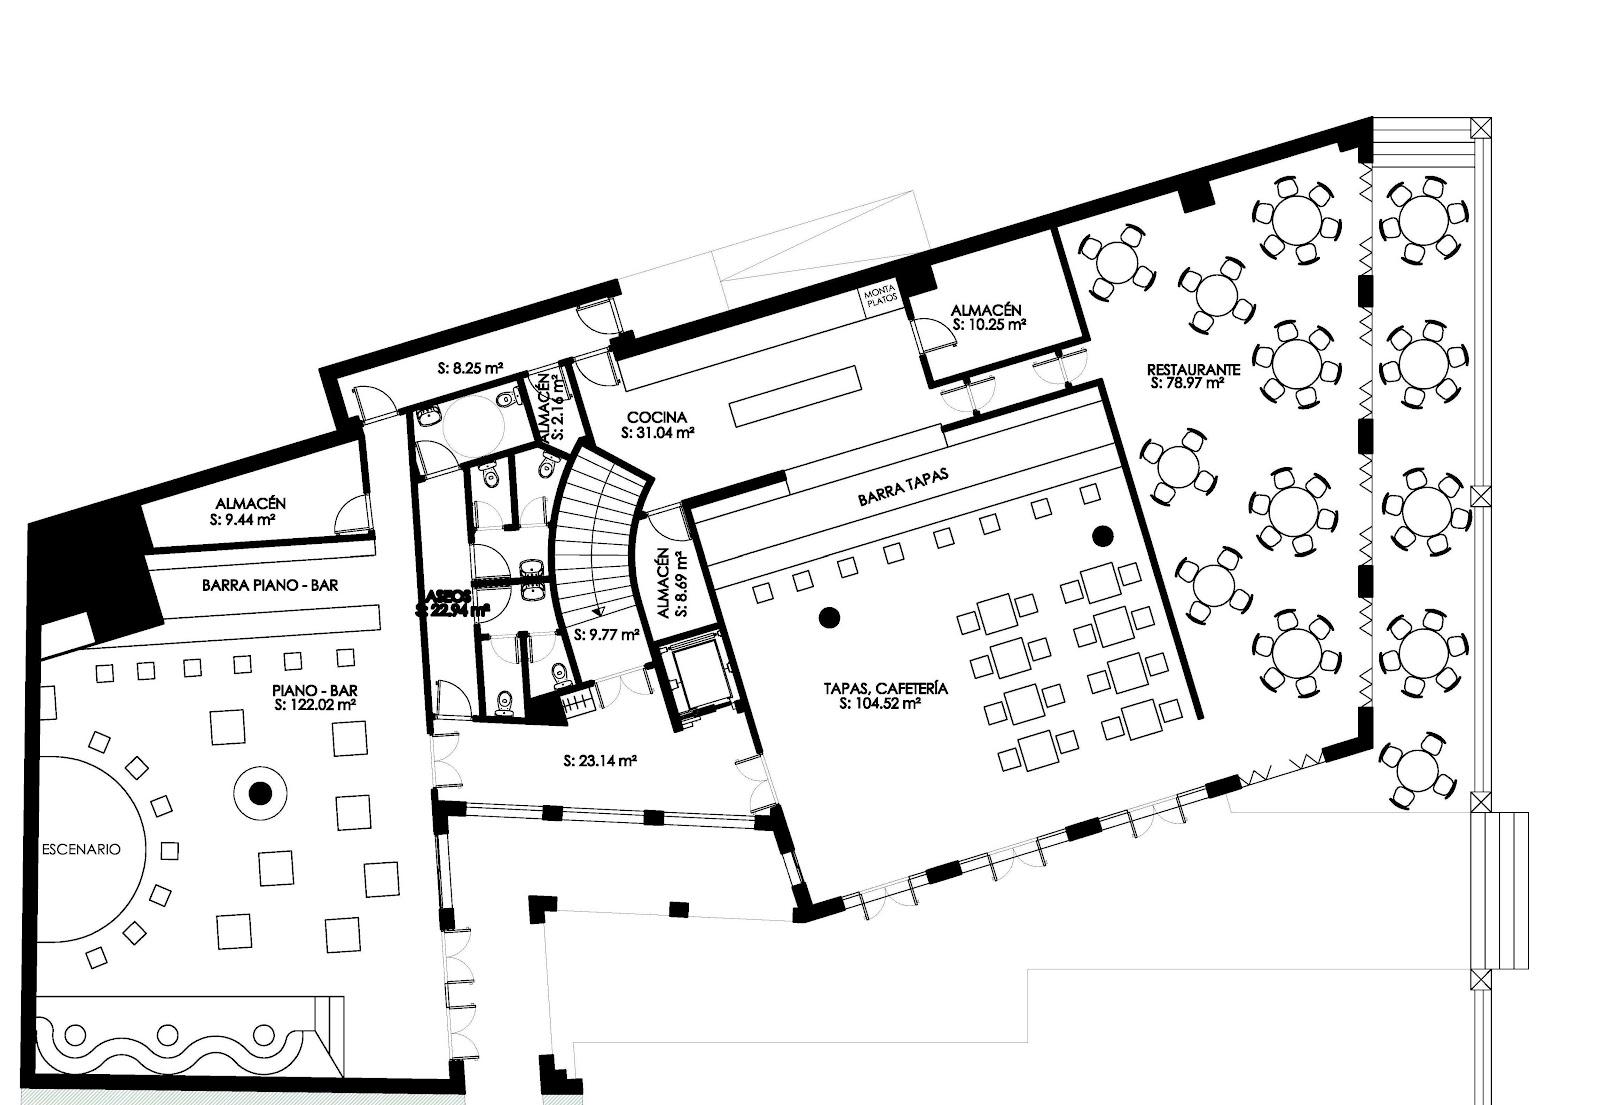 Curro criado arquitecto febrero 2012 for Distribucion cocina restaurante